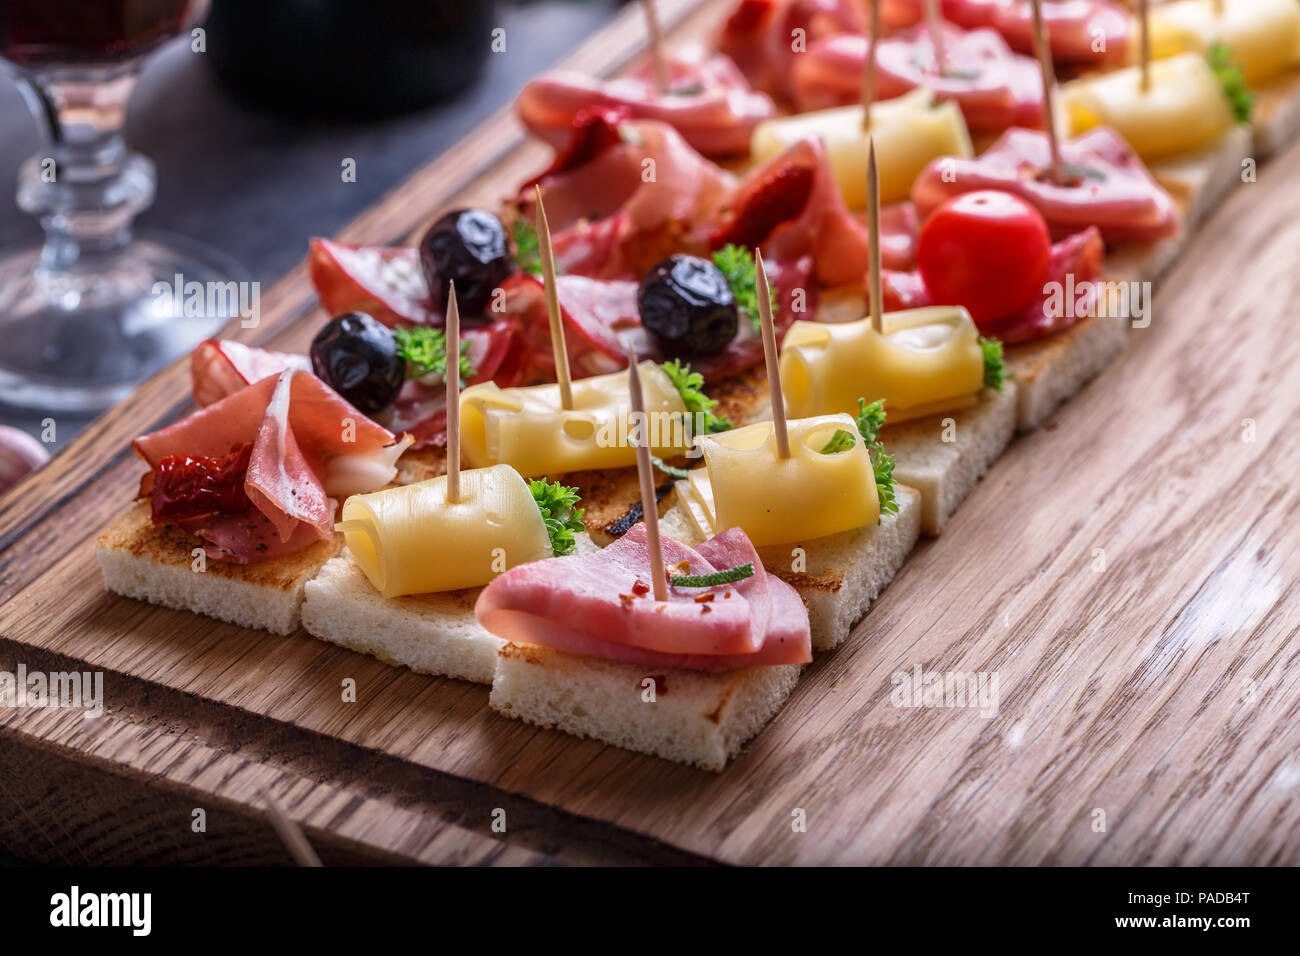 Viele pintxo oder, Tapas, spanische Canapes party Fingerfood Stockbild